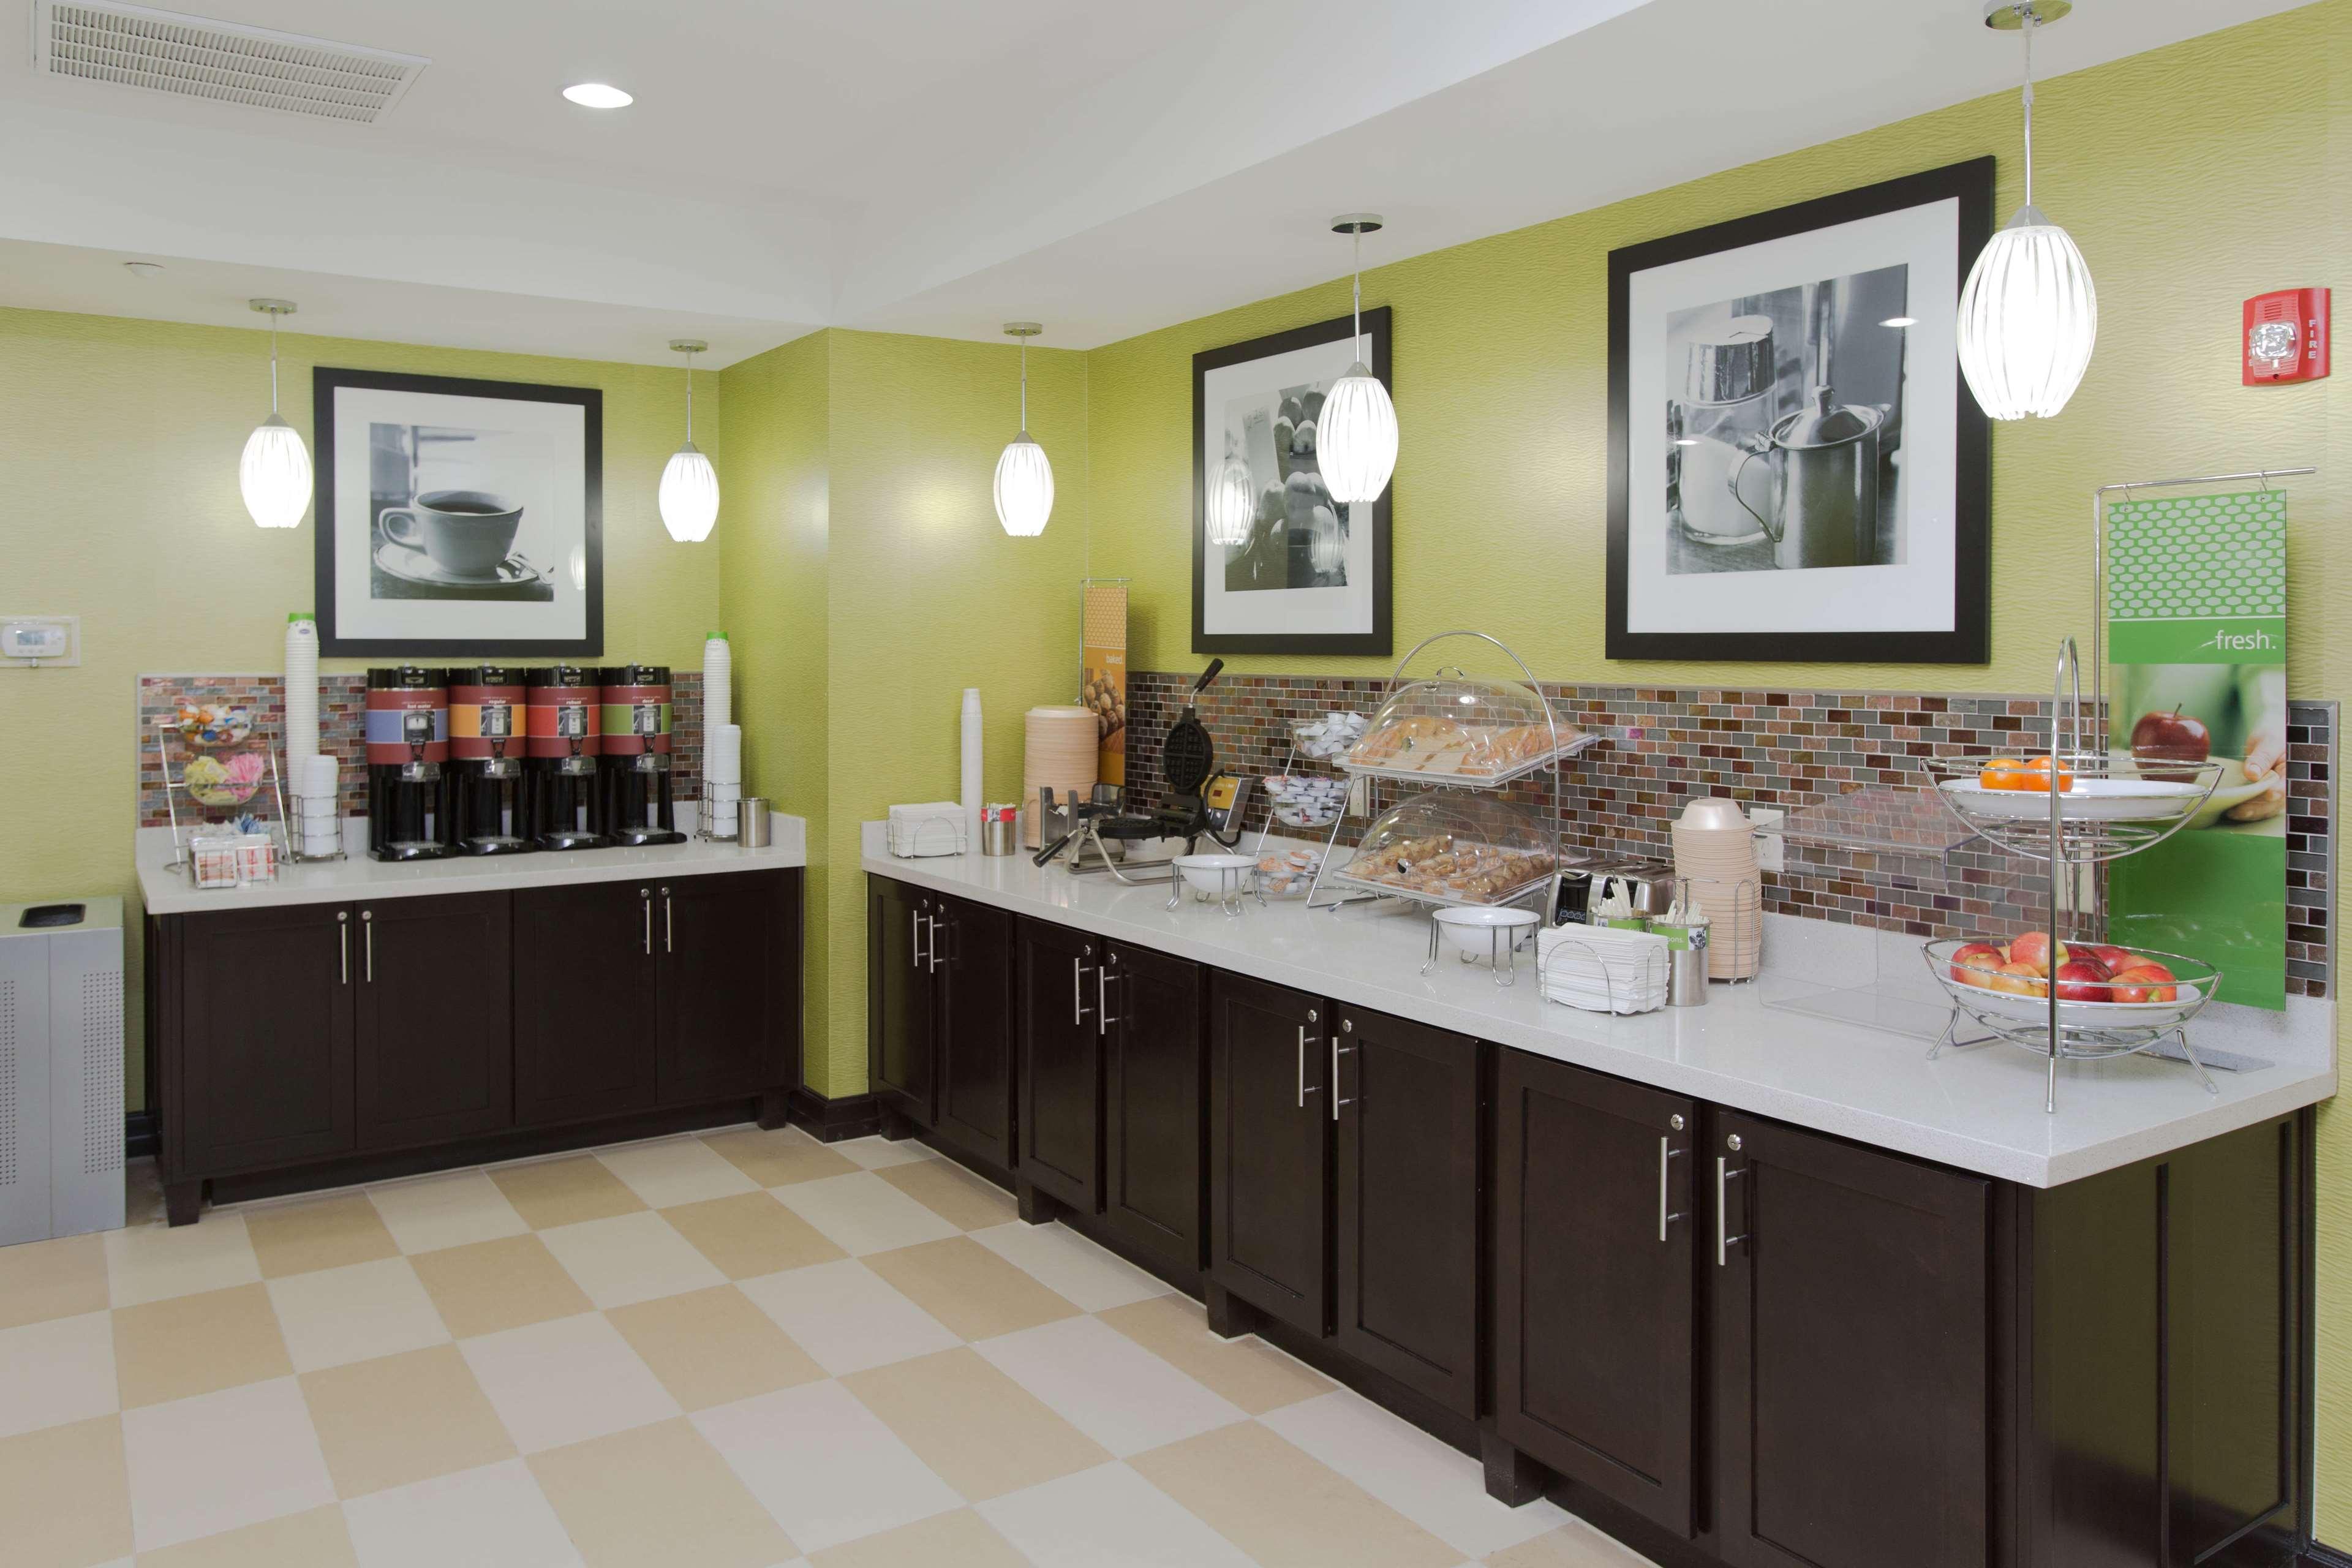 Hampton Inn & Suites Missouri City, TX image 17